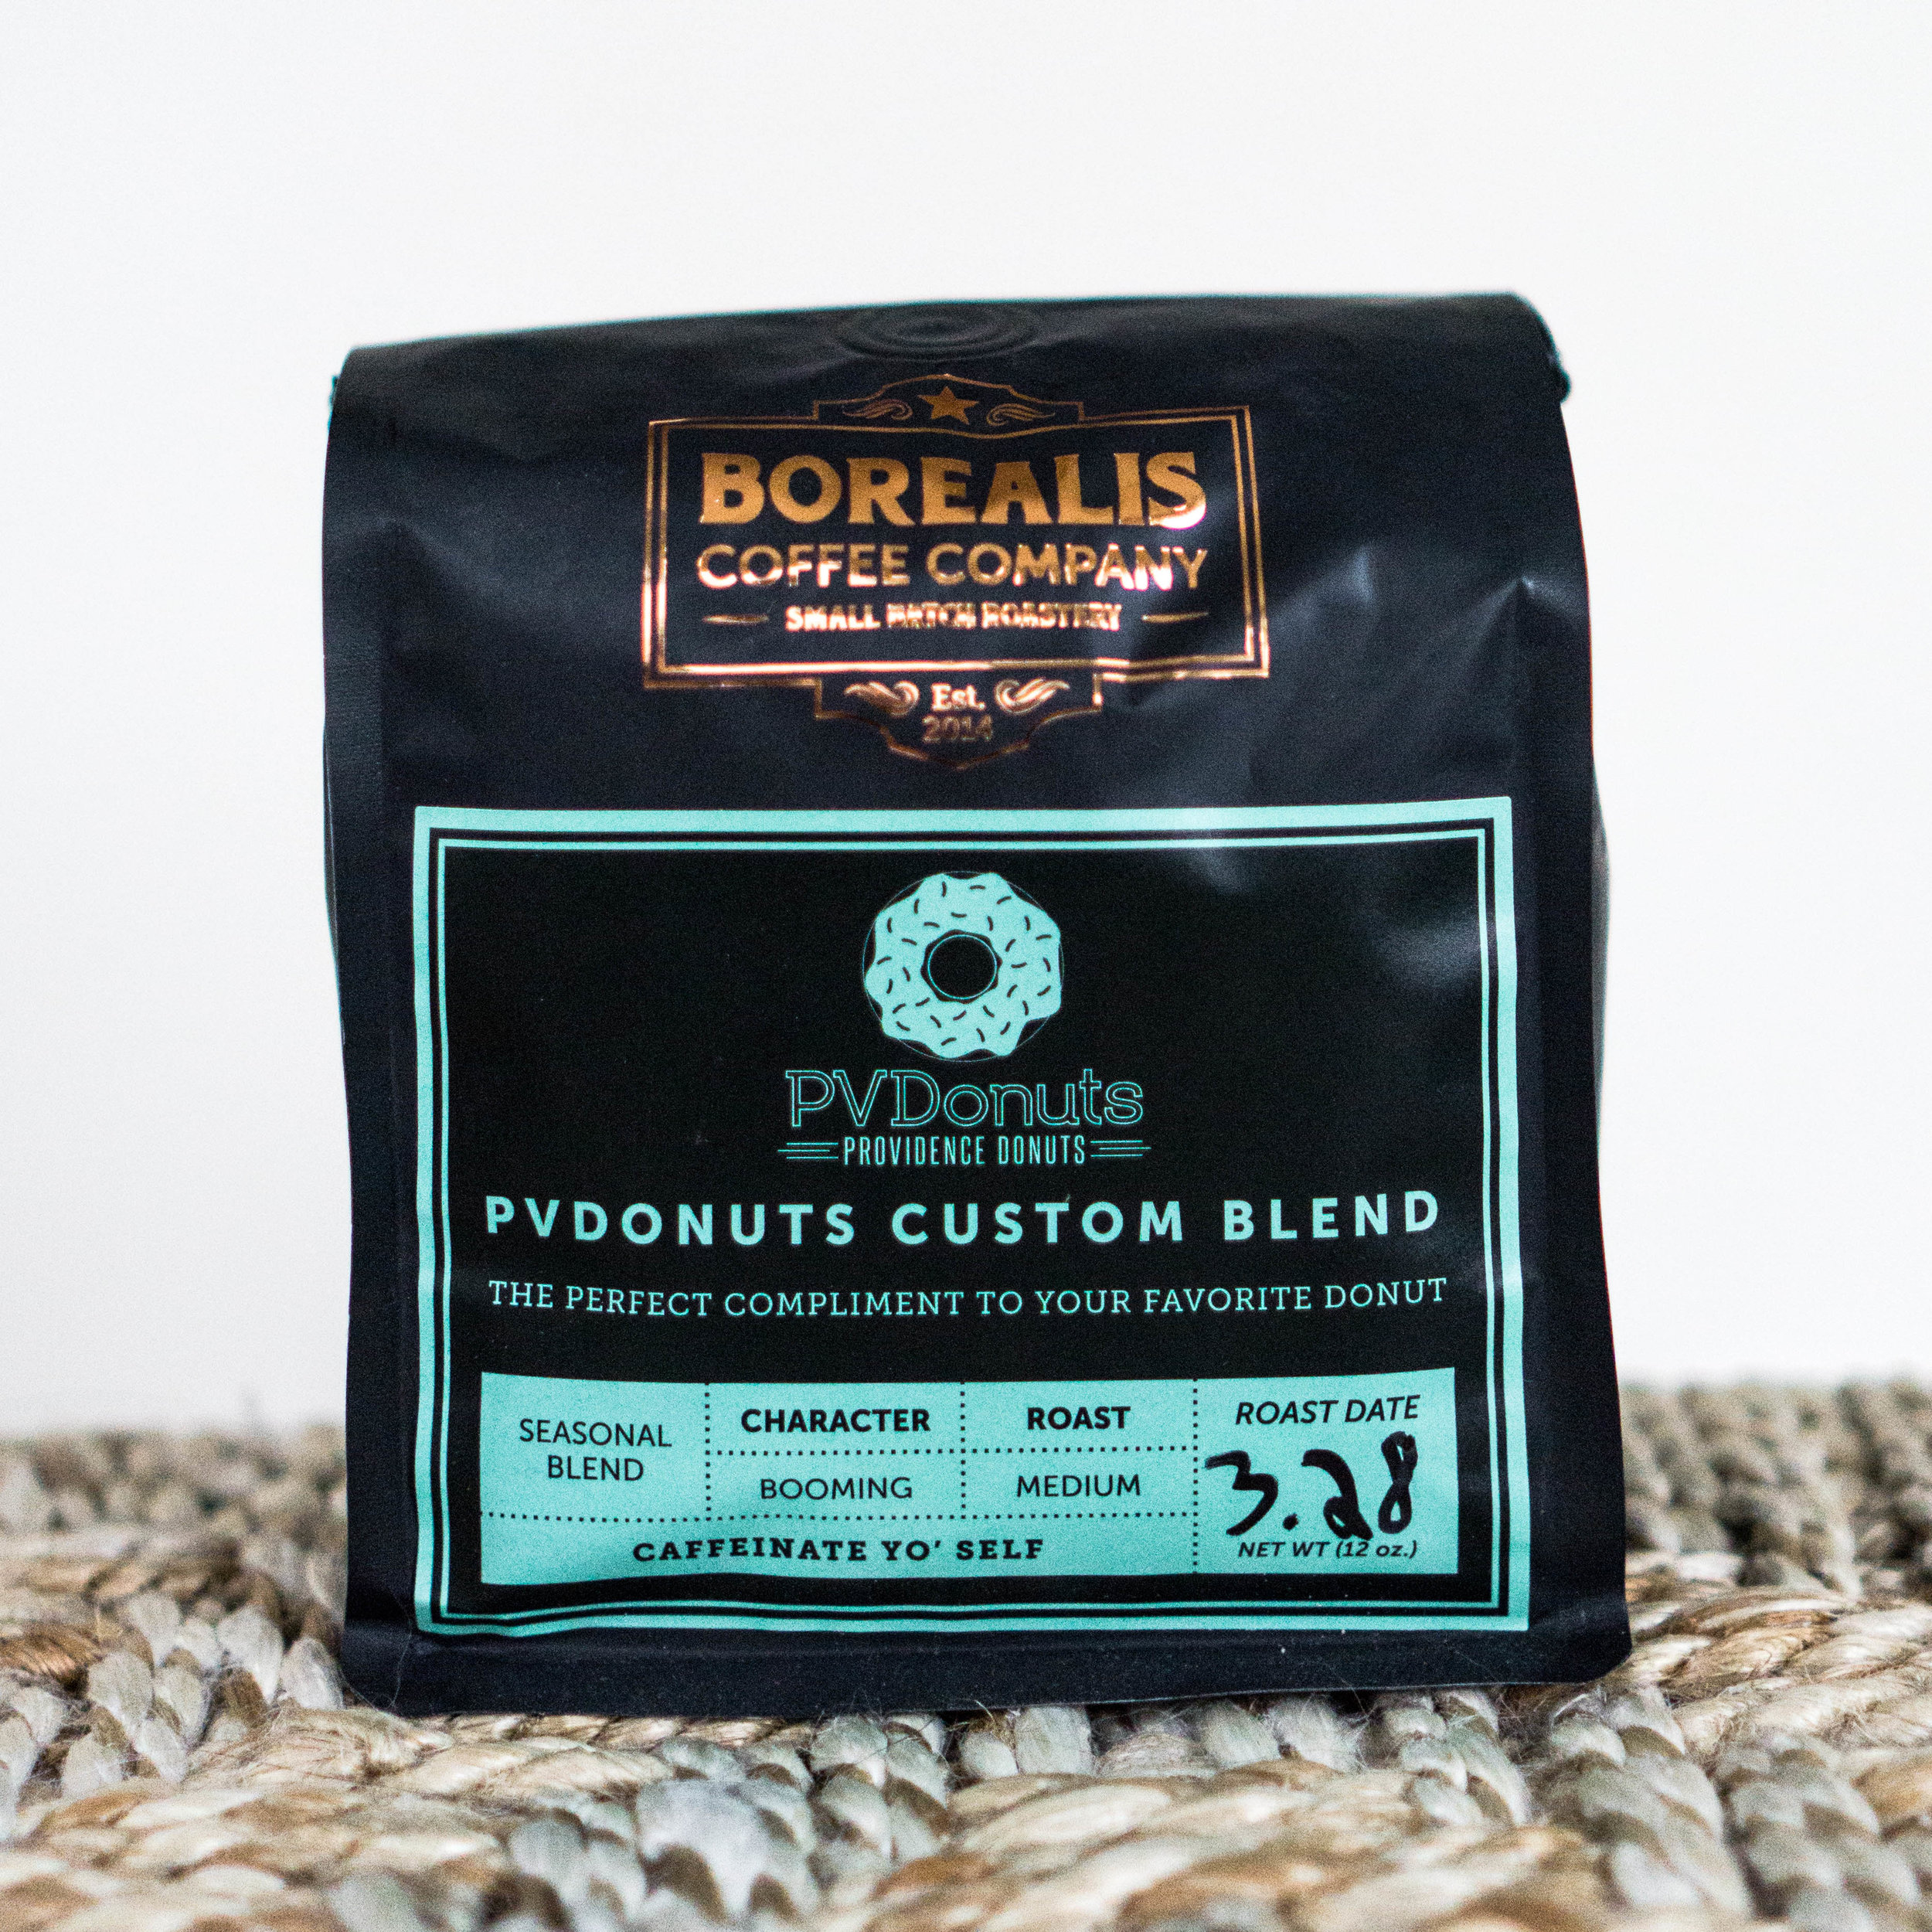 Borealis X PVDonuts Custom Blend - $16